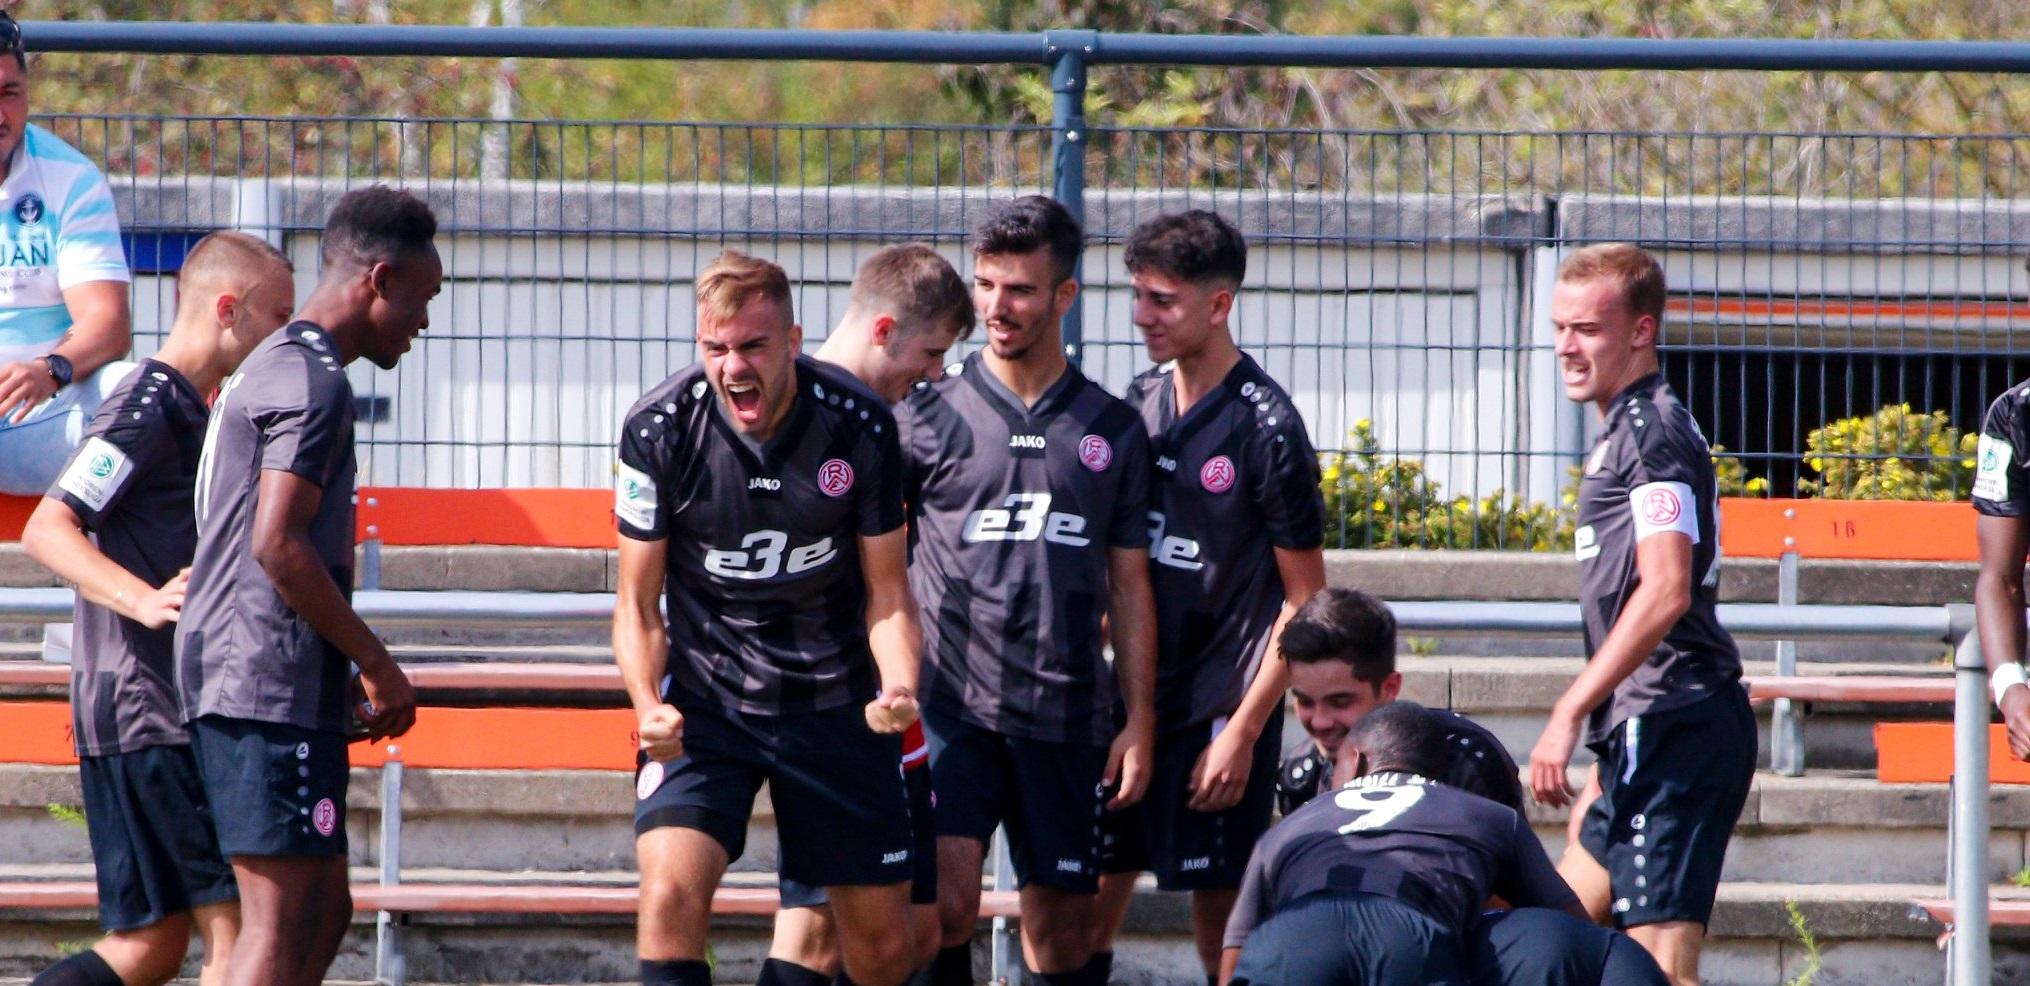 Die rot-weisse U19 ist Herbstmeister. (Foto:Breilmannswiese)